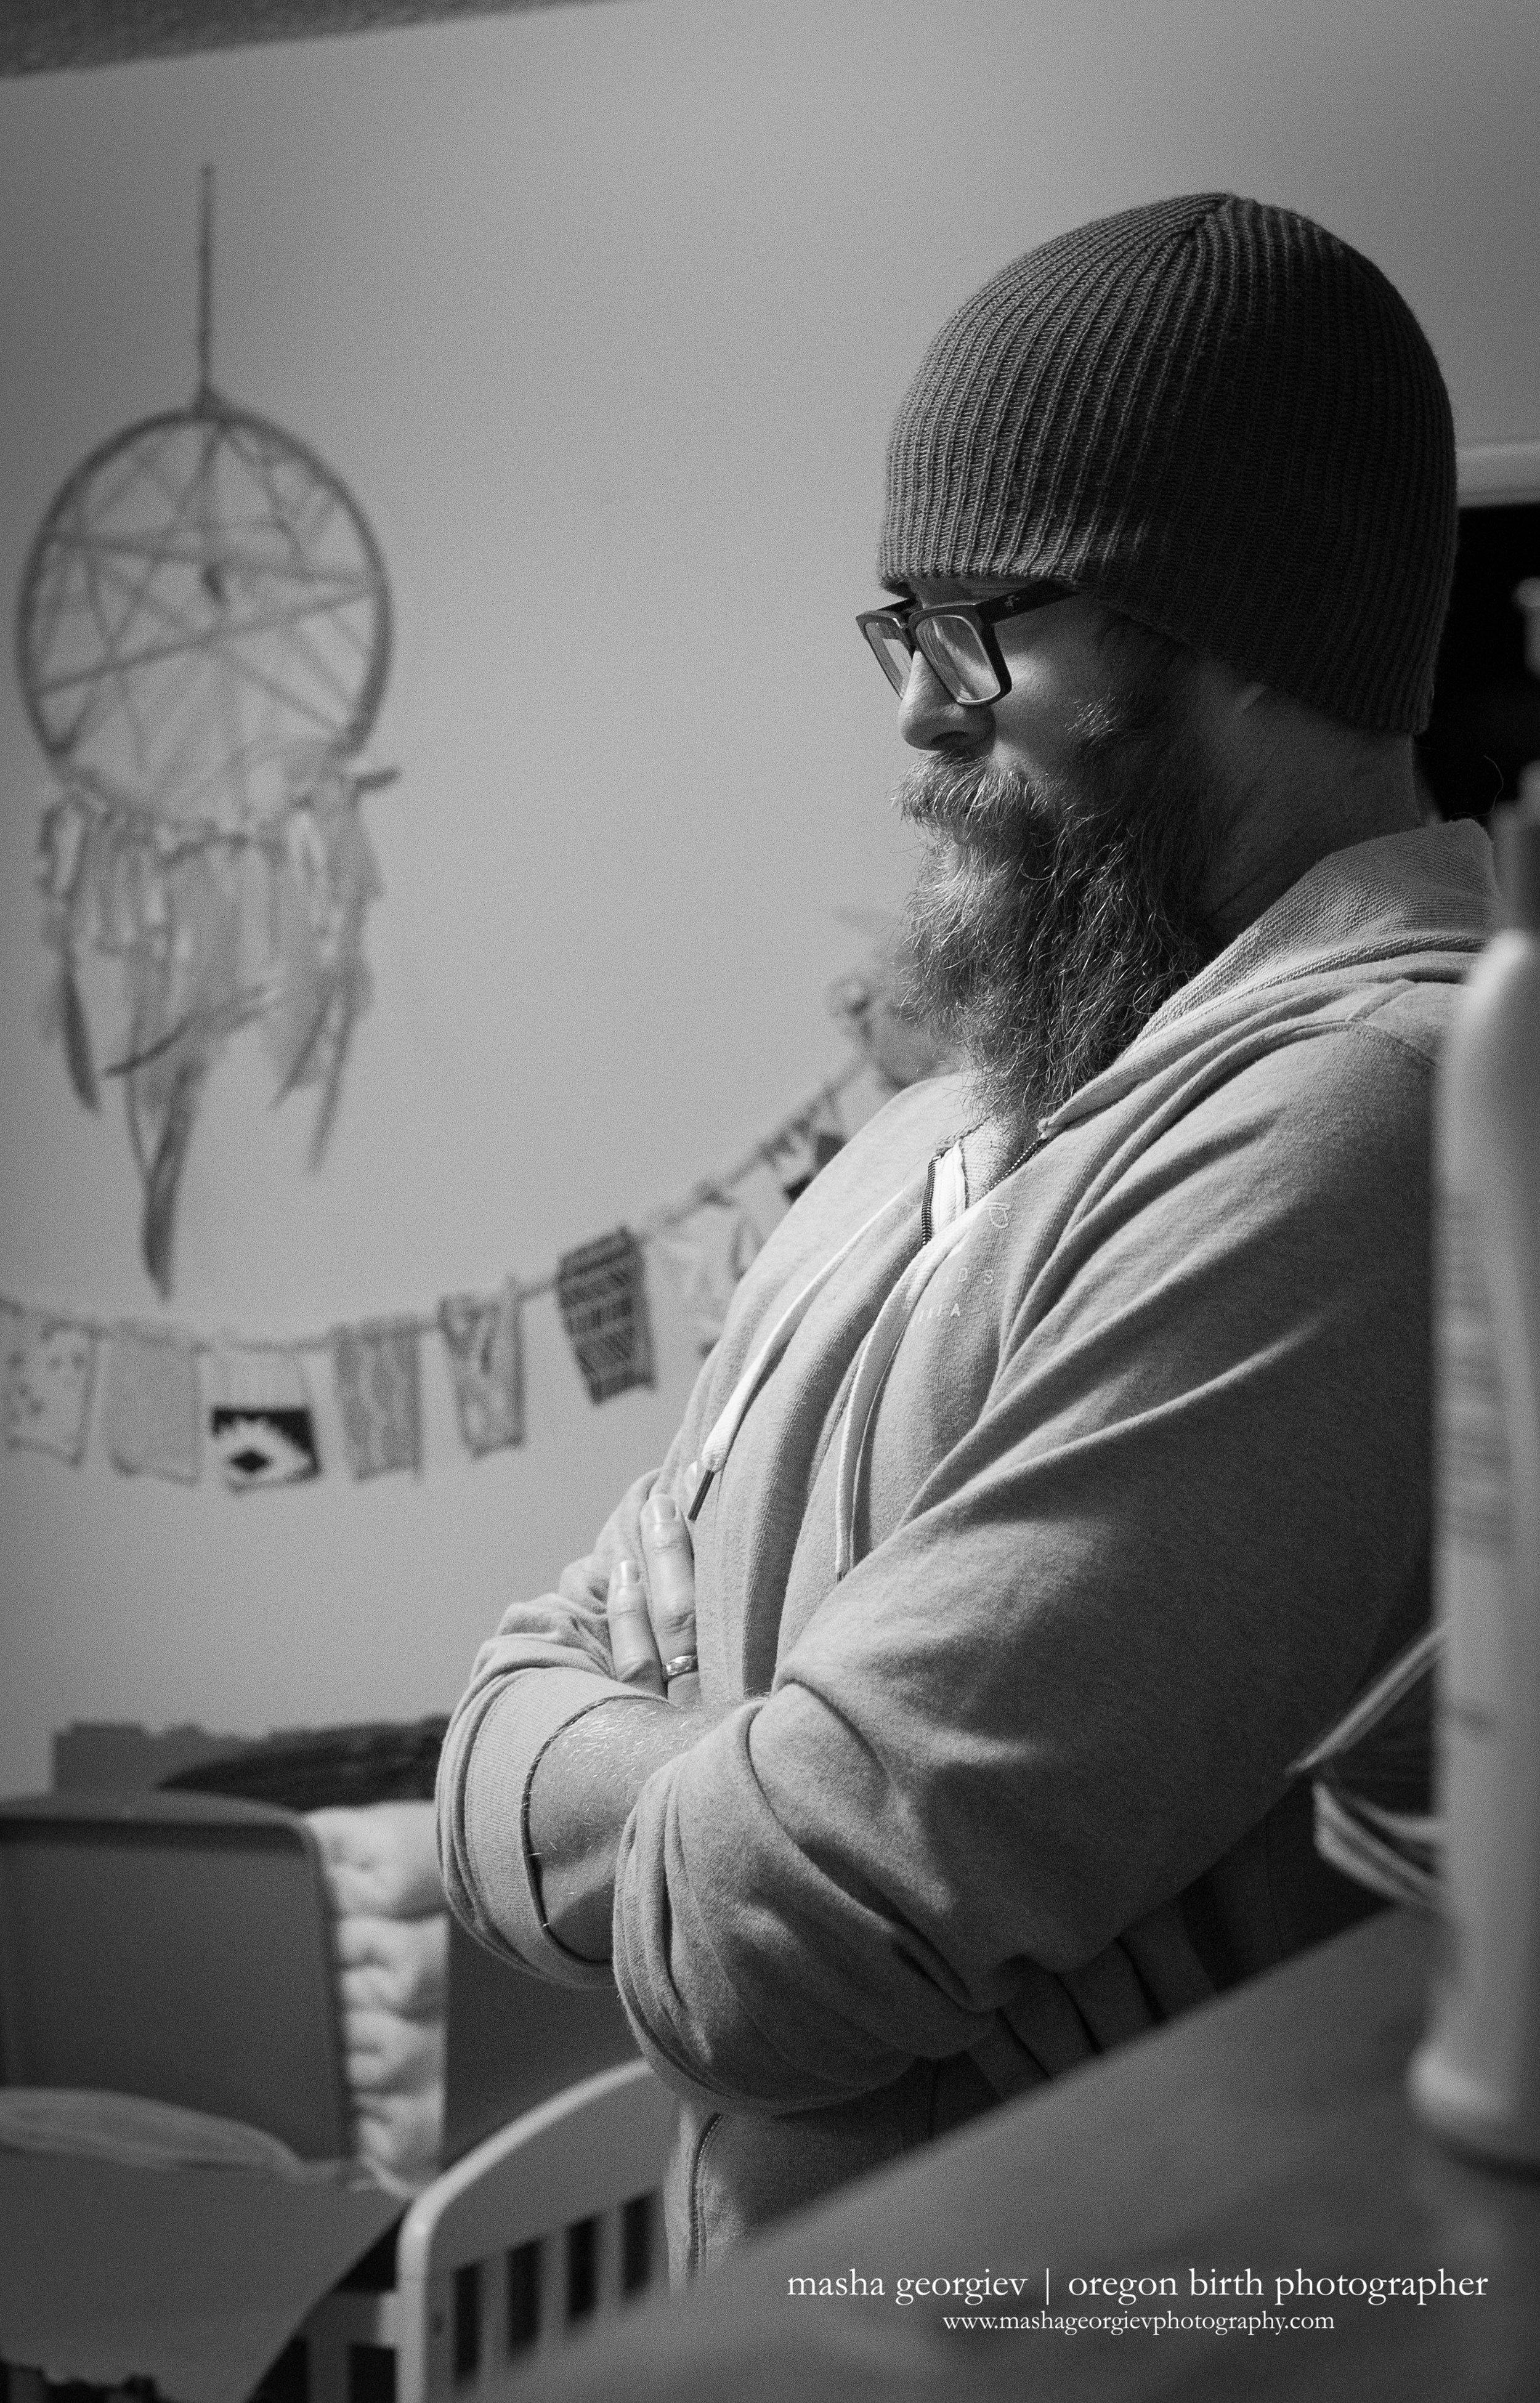 Oregon-Birth-Photographer-6.jpg